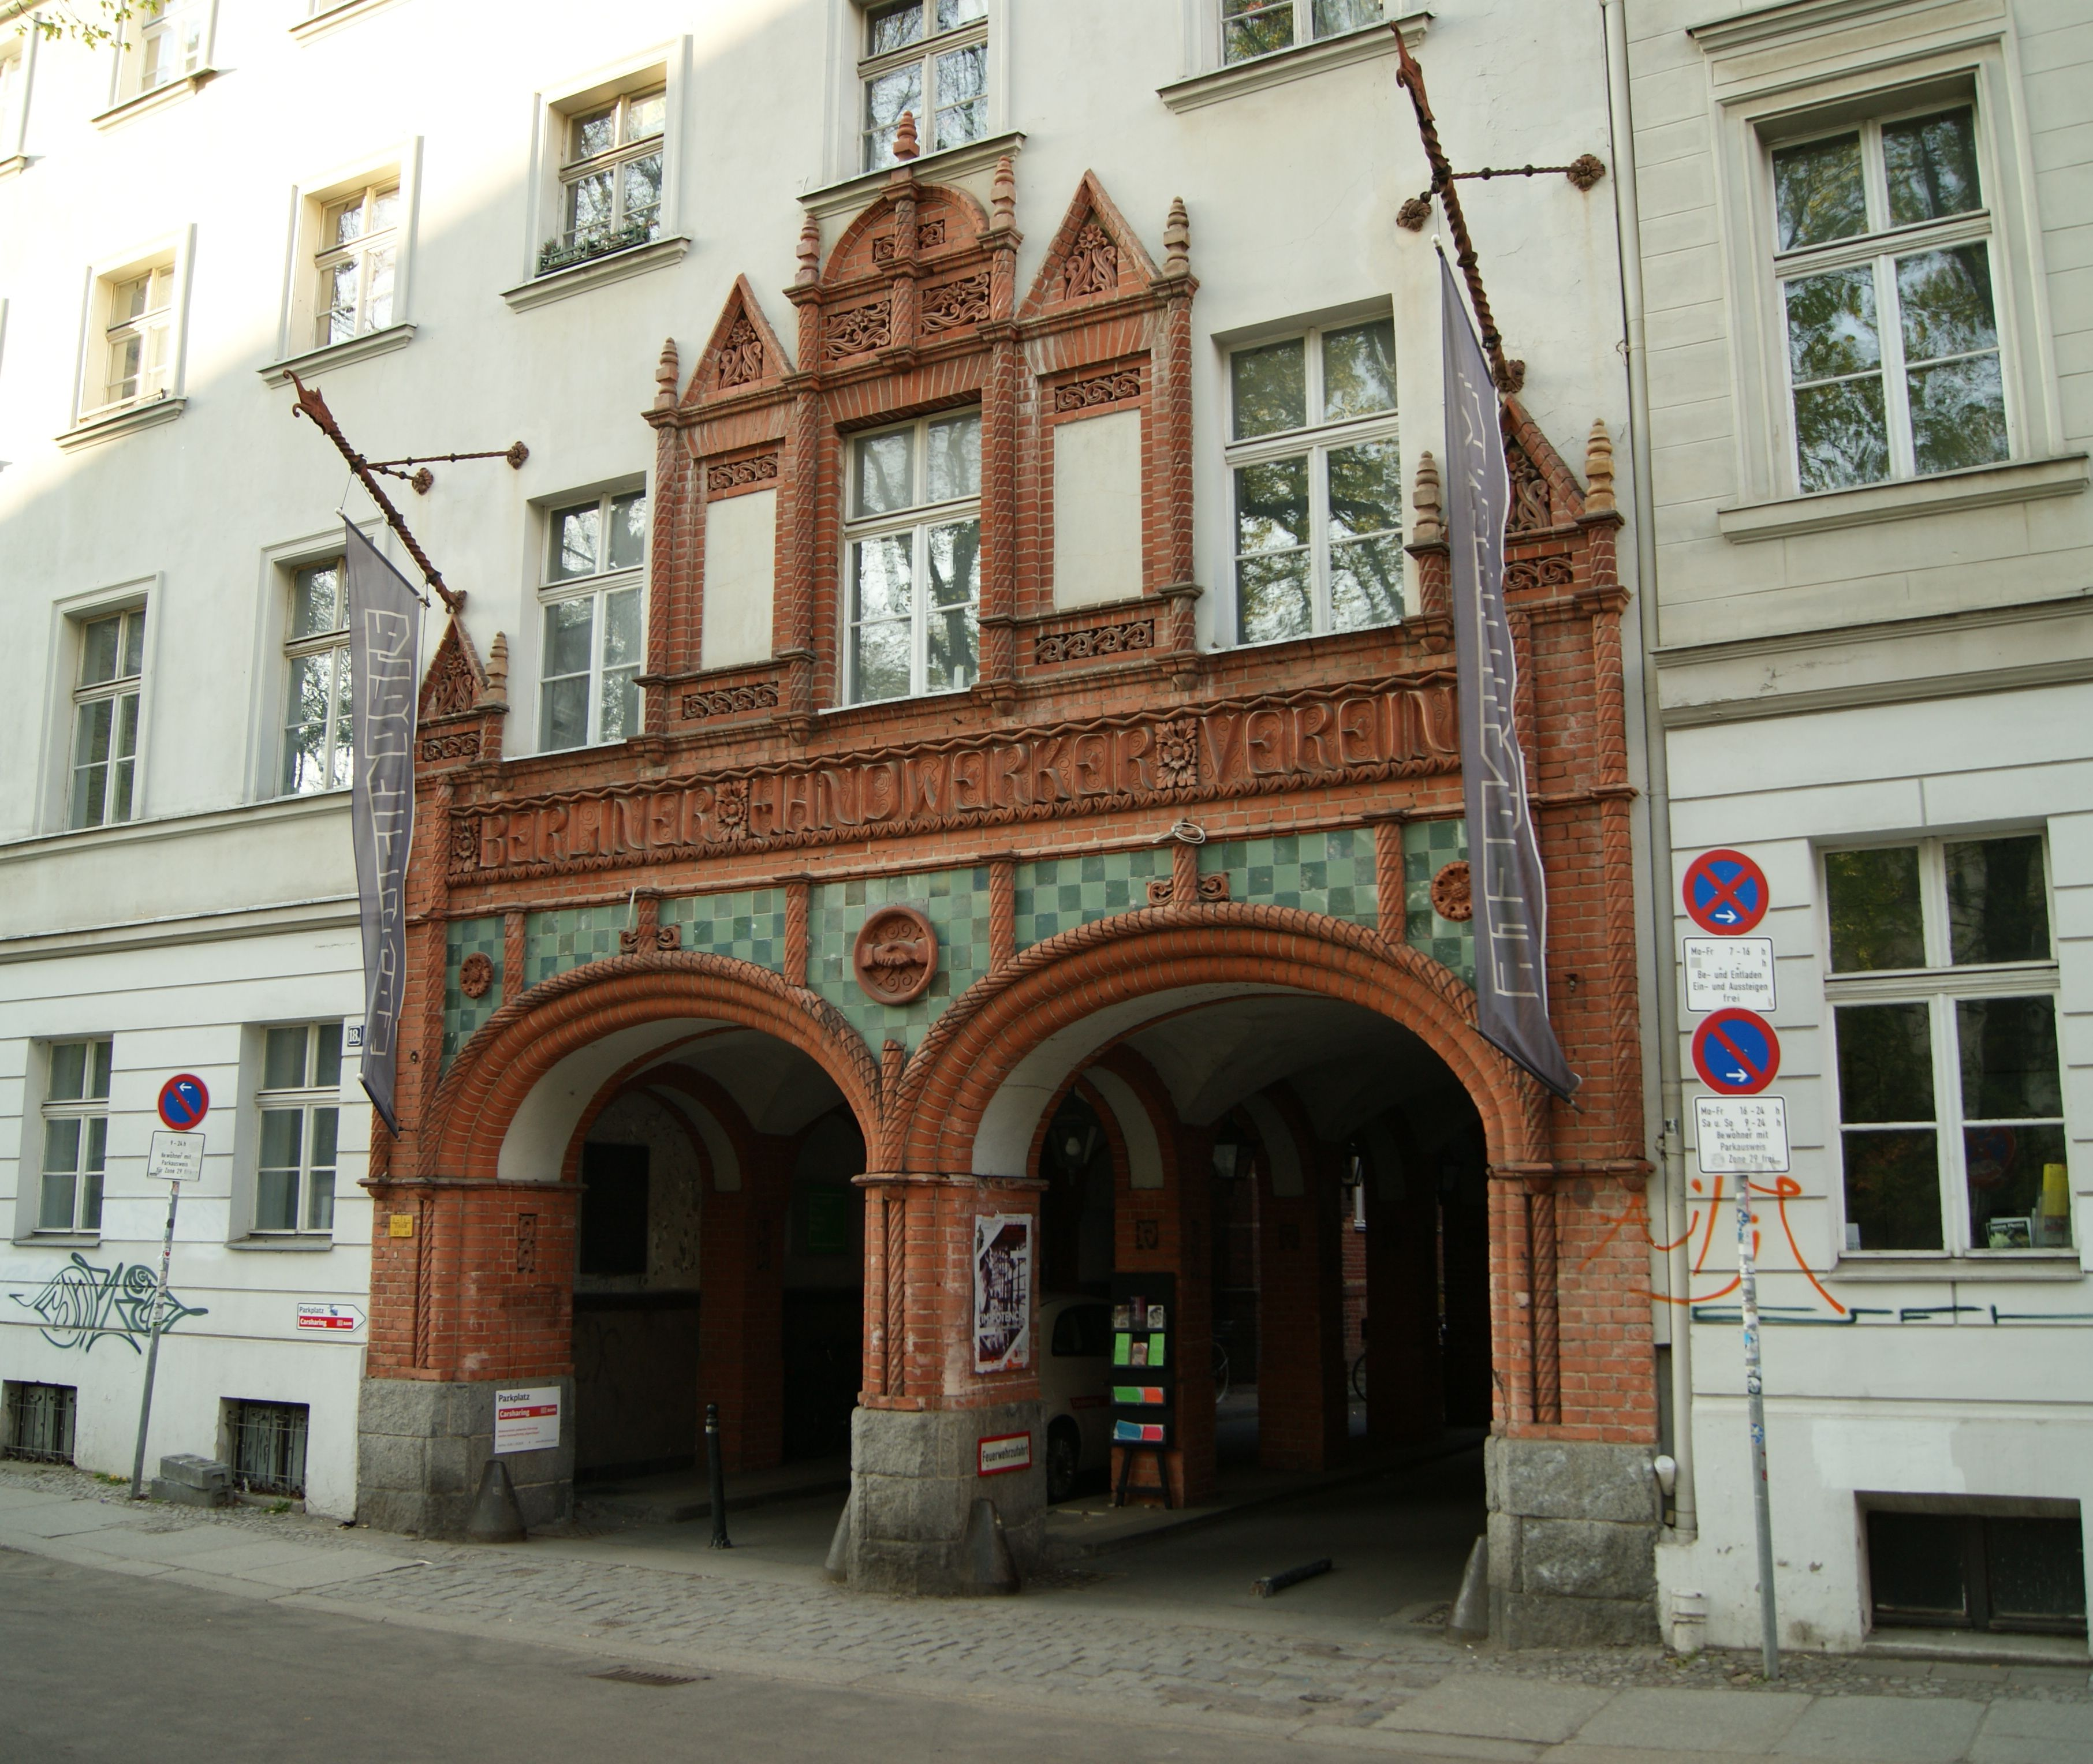 Handwerker Berlin file terracotta doppelportal der ehemaligen handwerkervereinshaus